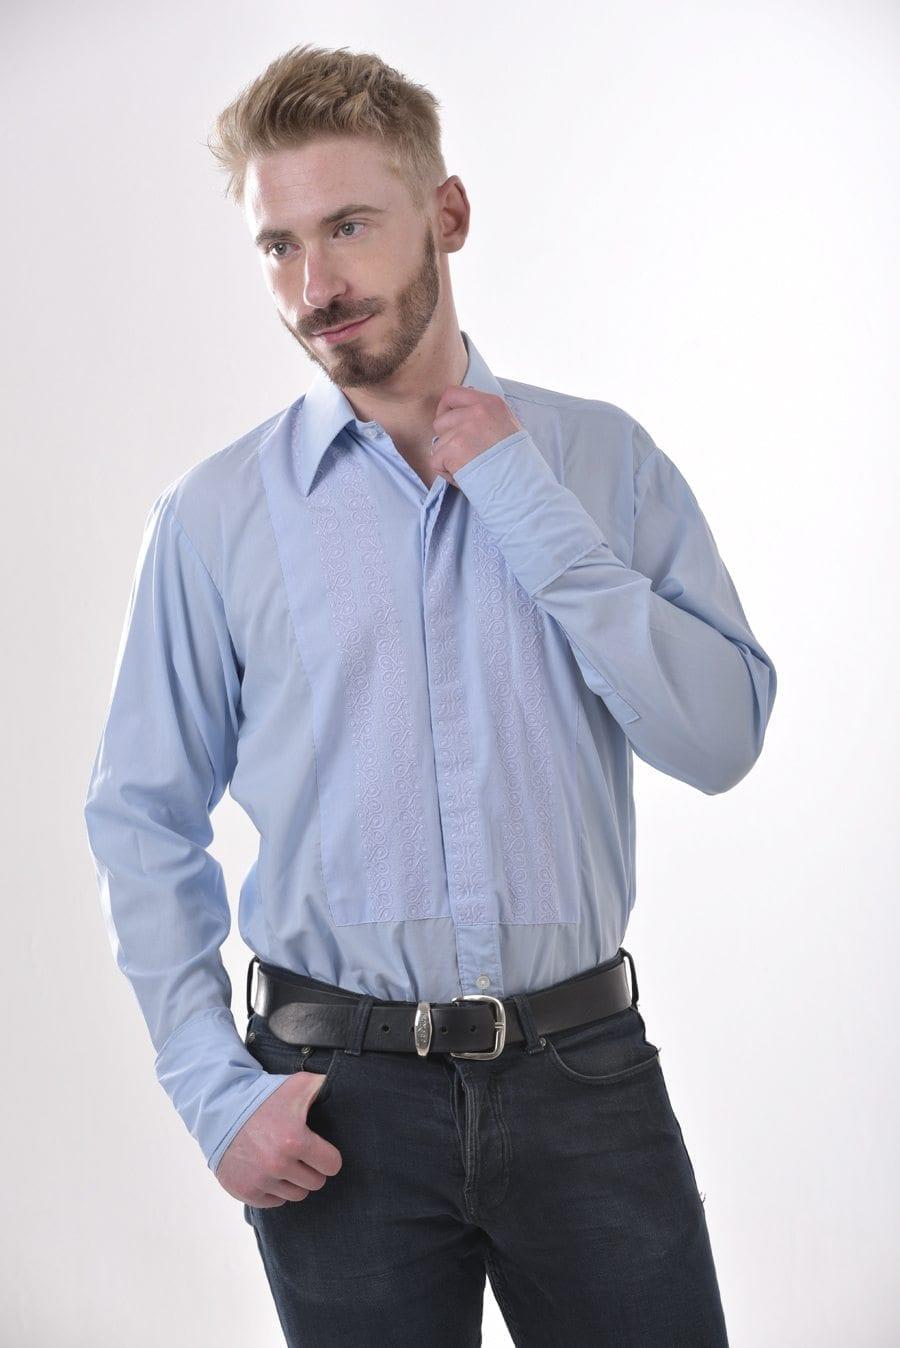 Vintage evening shirt